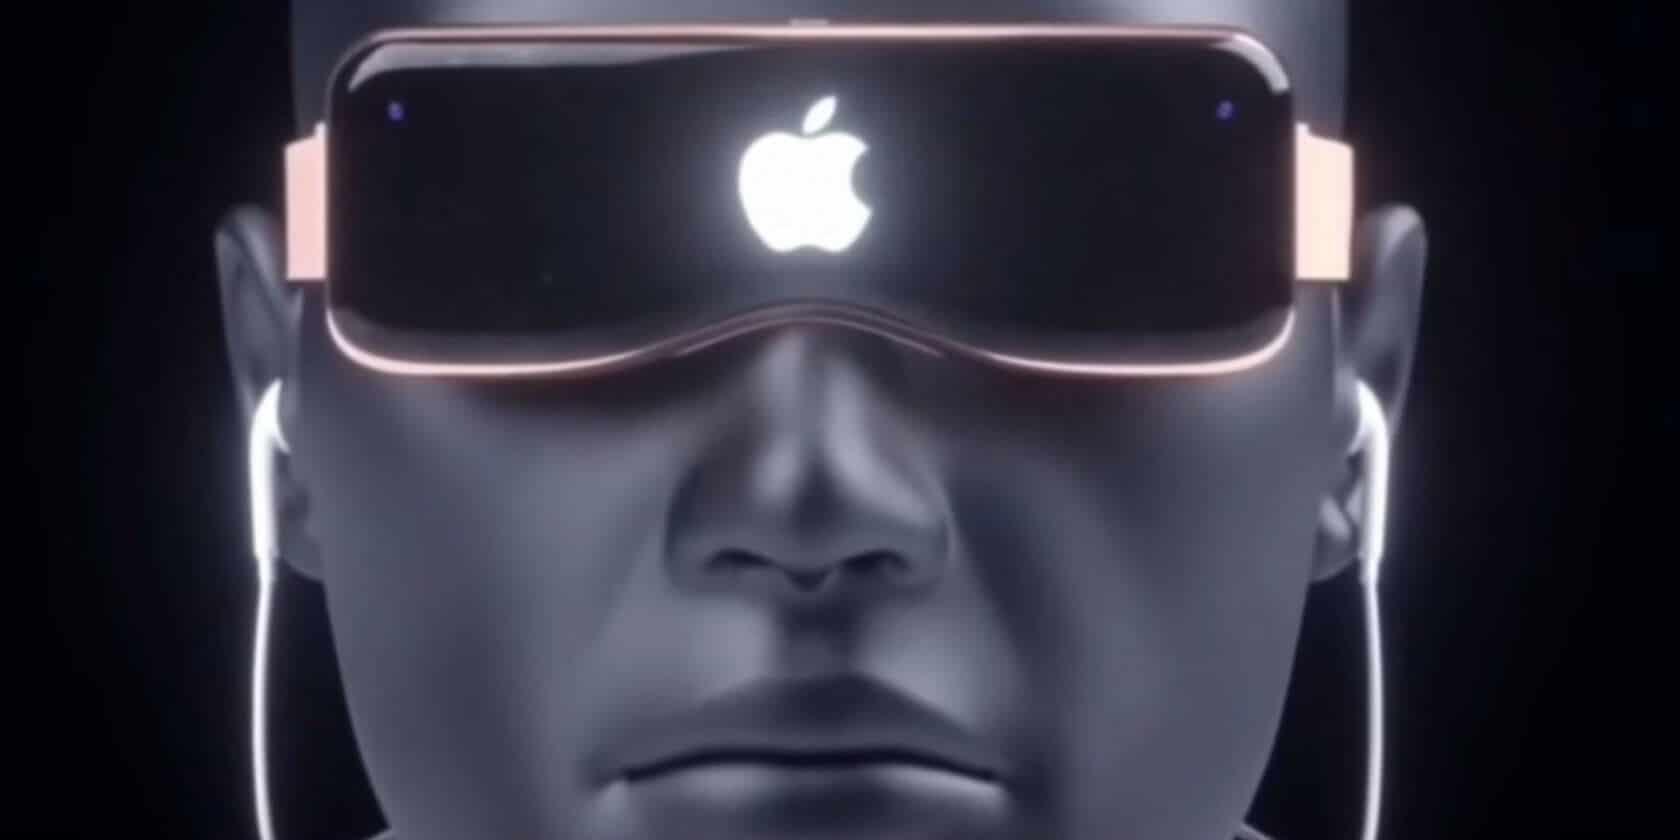 casque AR-VR Apple